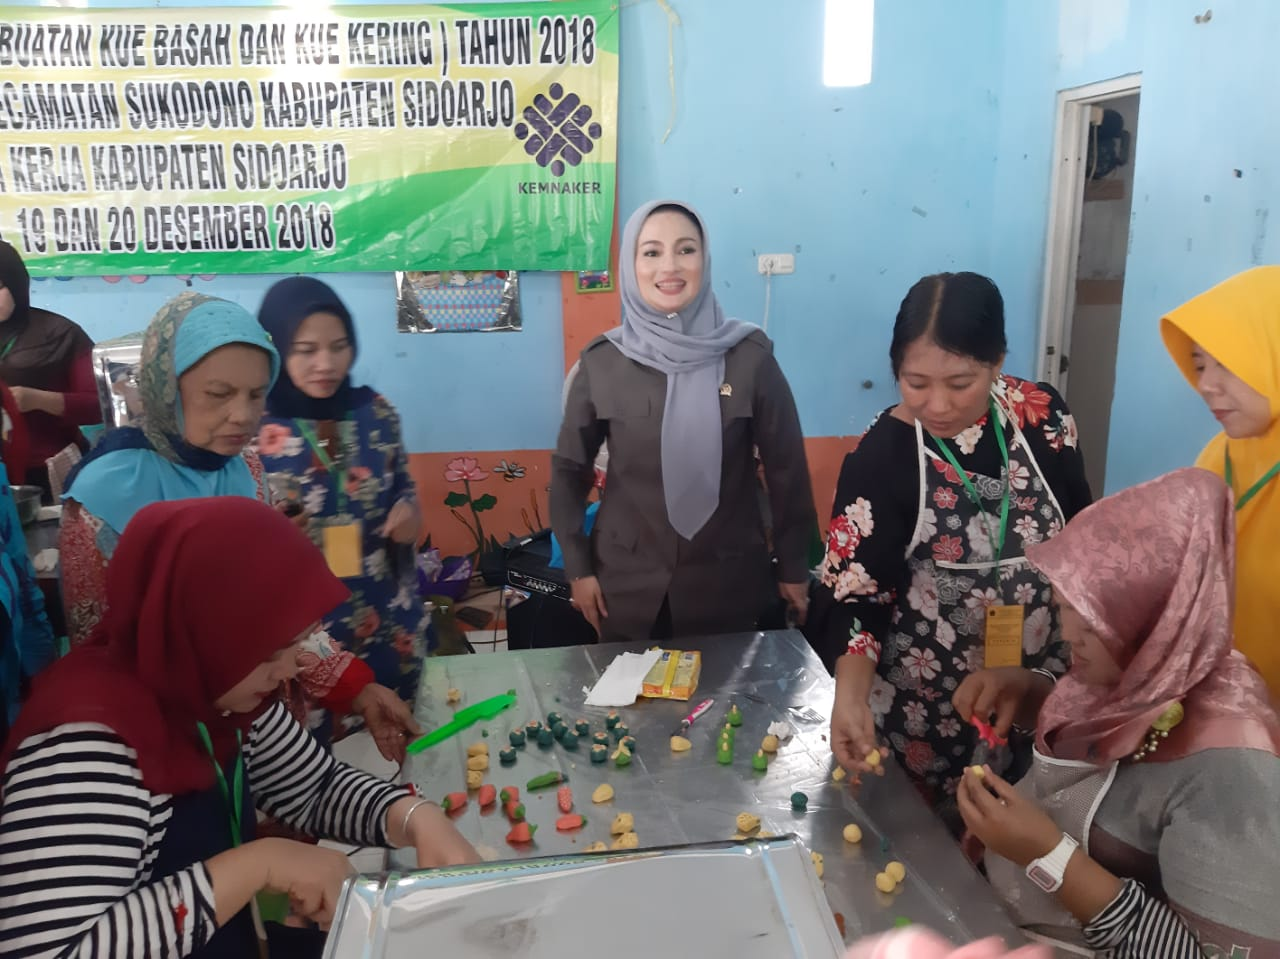 Tepat Sasaran, Ning Lucy Puas Dengan Program Padat Karya Bhayangkara